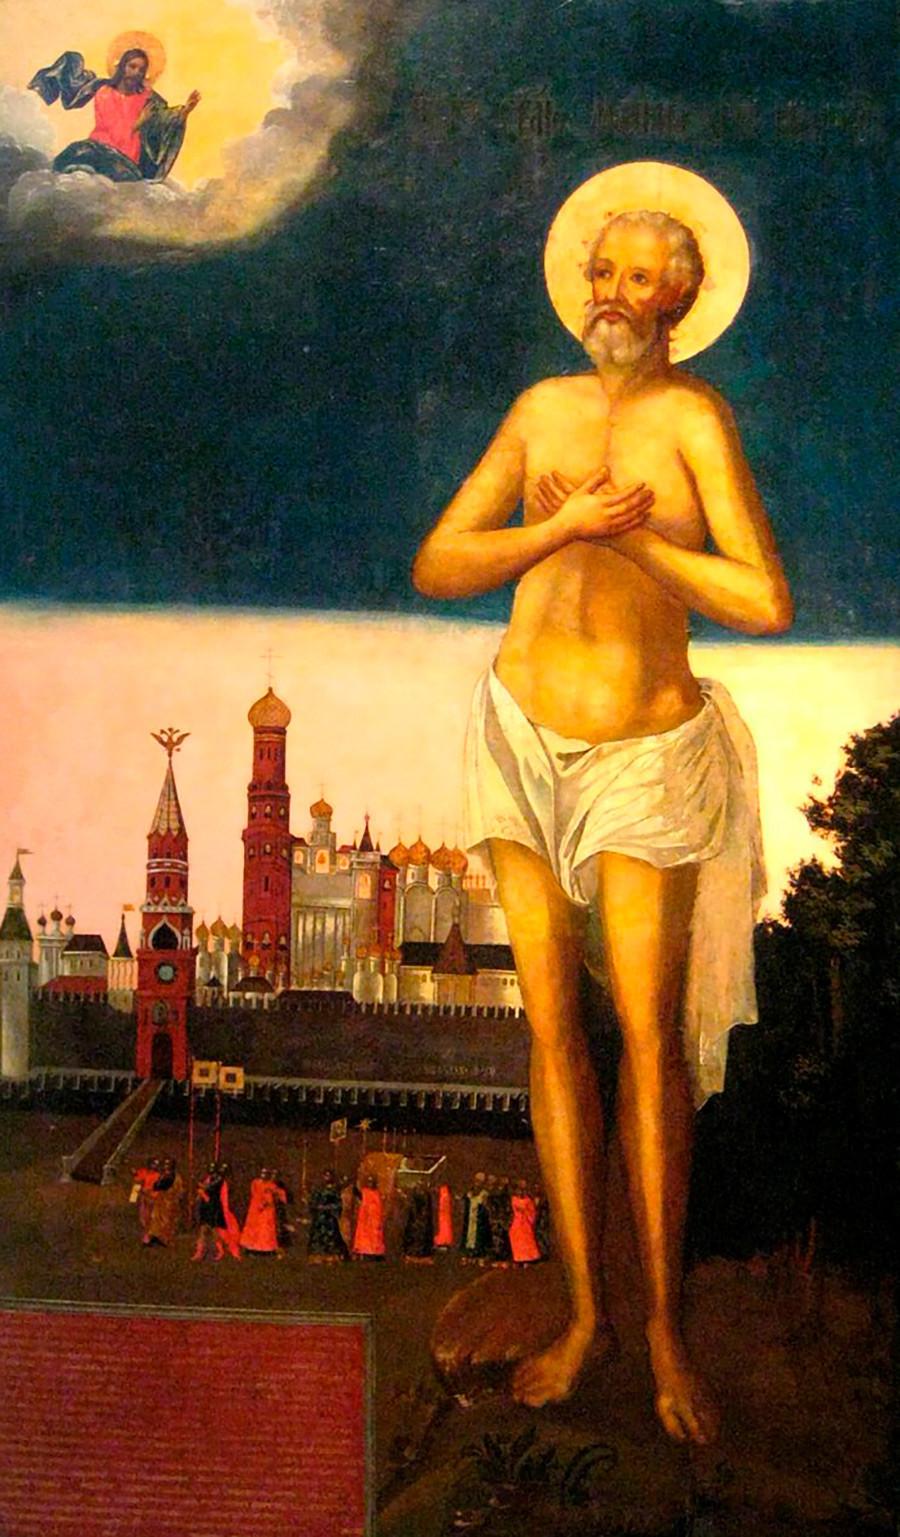 Maksim Blaženi. Ikona, XVIII. stoletje, Državna Tretjakovska galerija